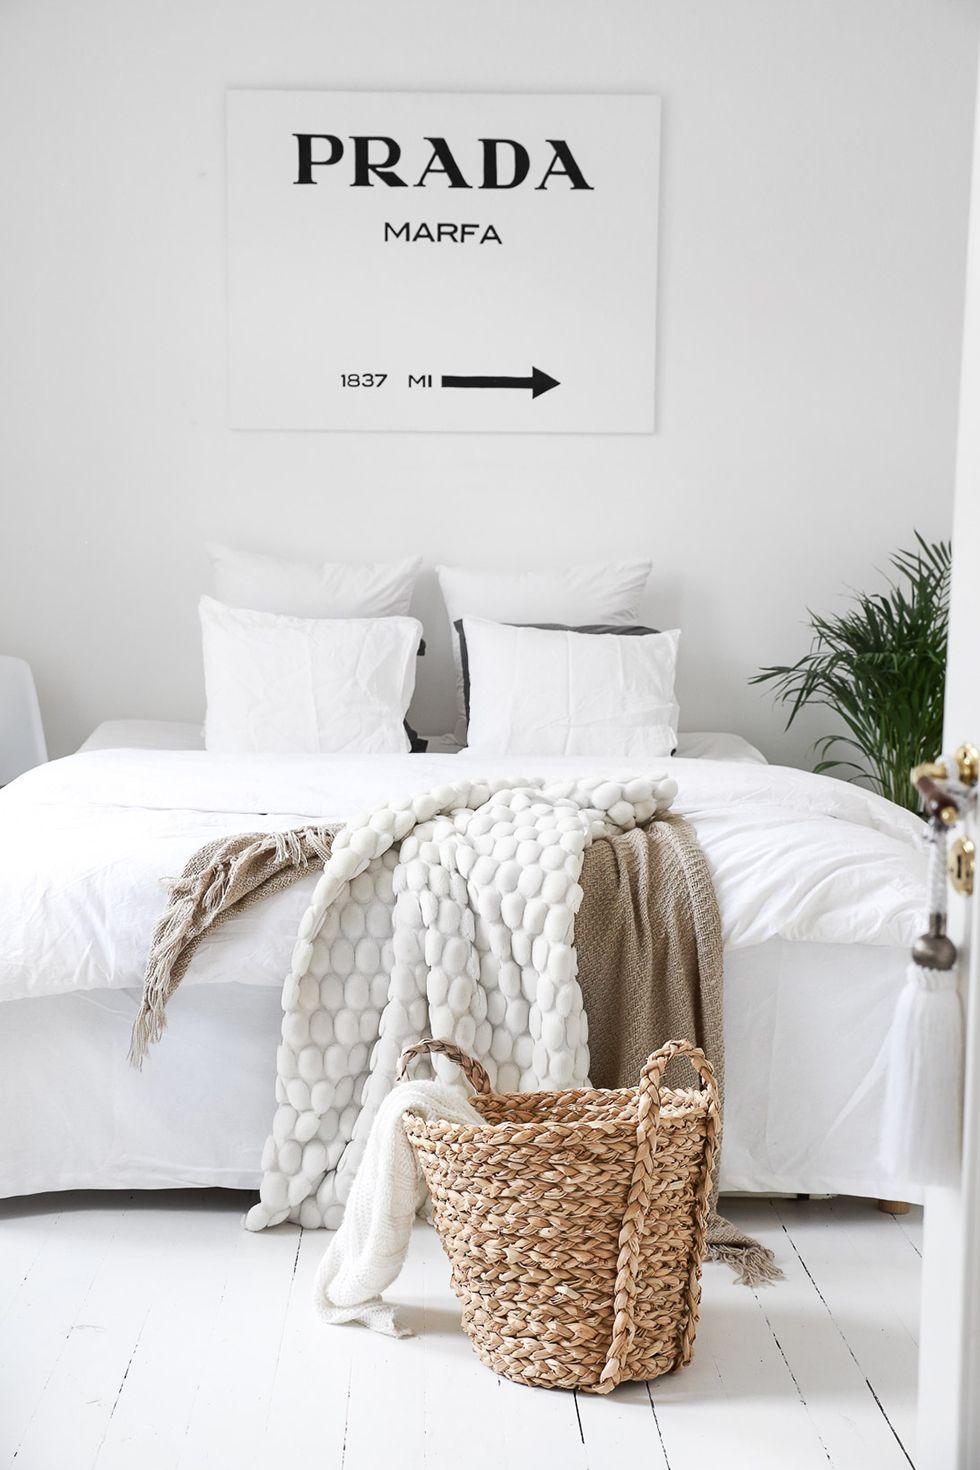 all white rooms 33 all white room ideas for decor minimalists |  Stylecaster ||  @ralotibetanrugs ZWZBJQF